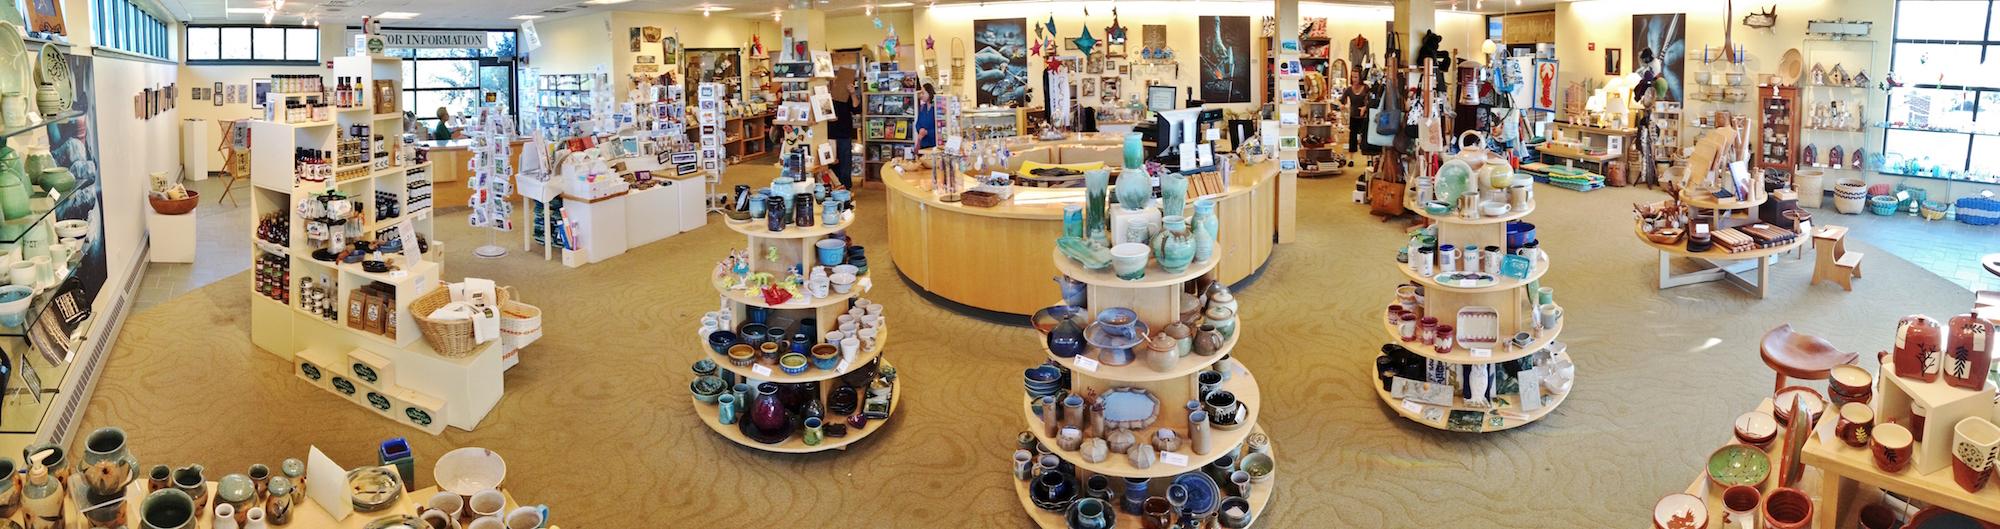 MCA: Center for Maine Craft